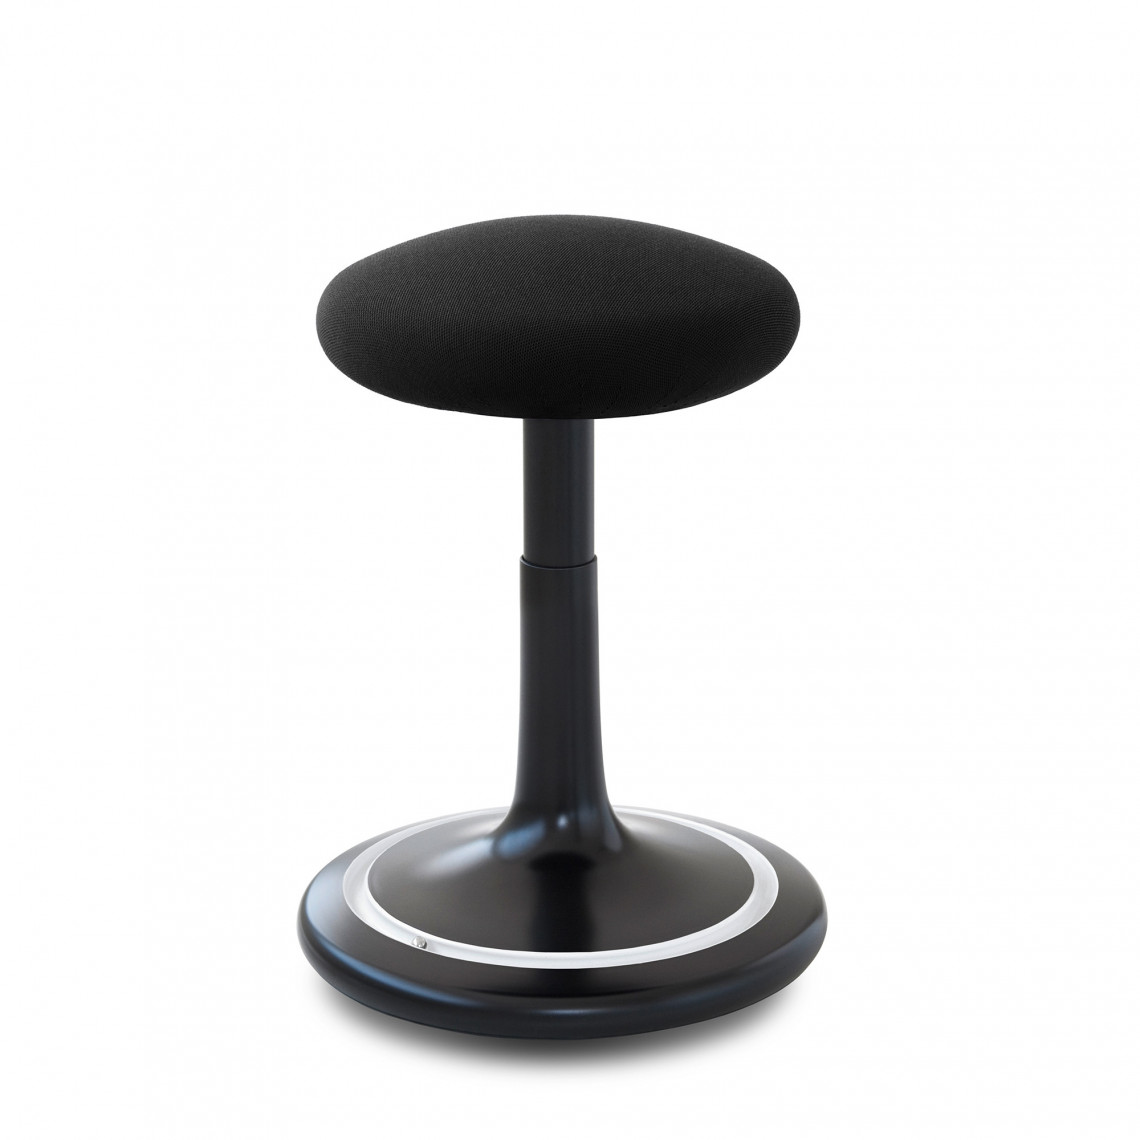 Ongo Classic Regular - Balanspall sitthöjd 42-64 cm